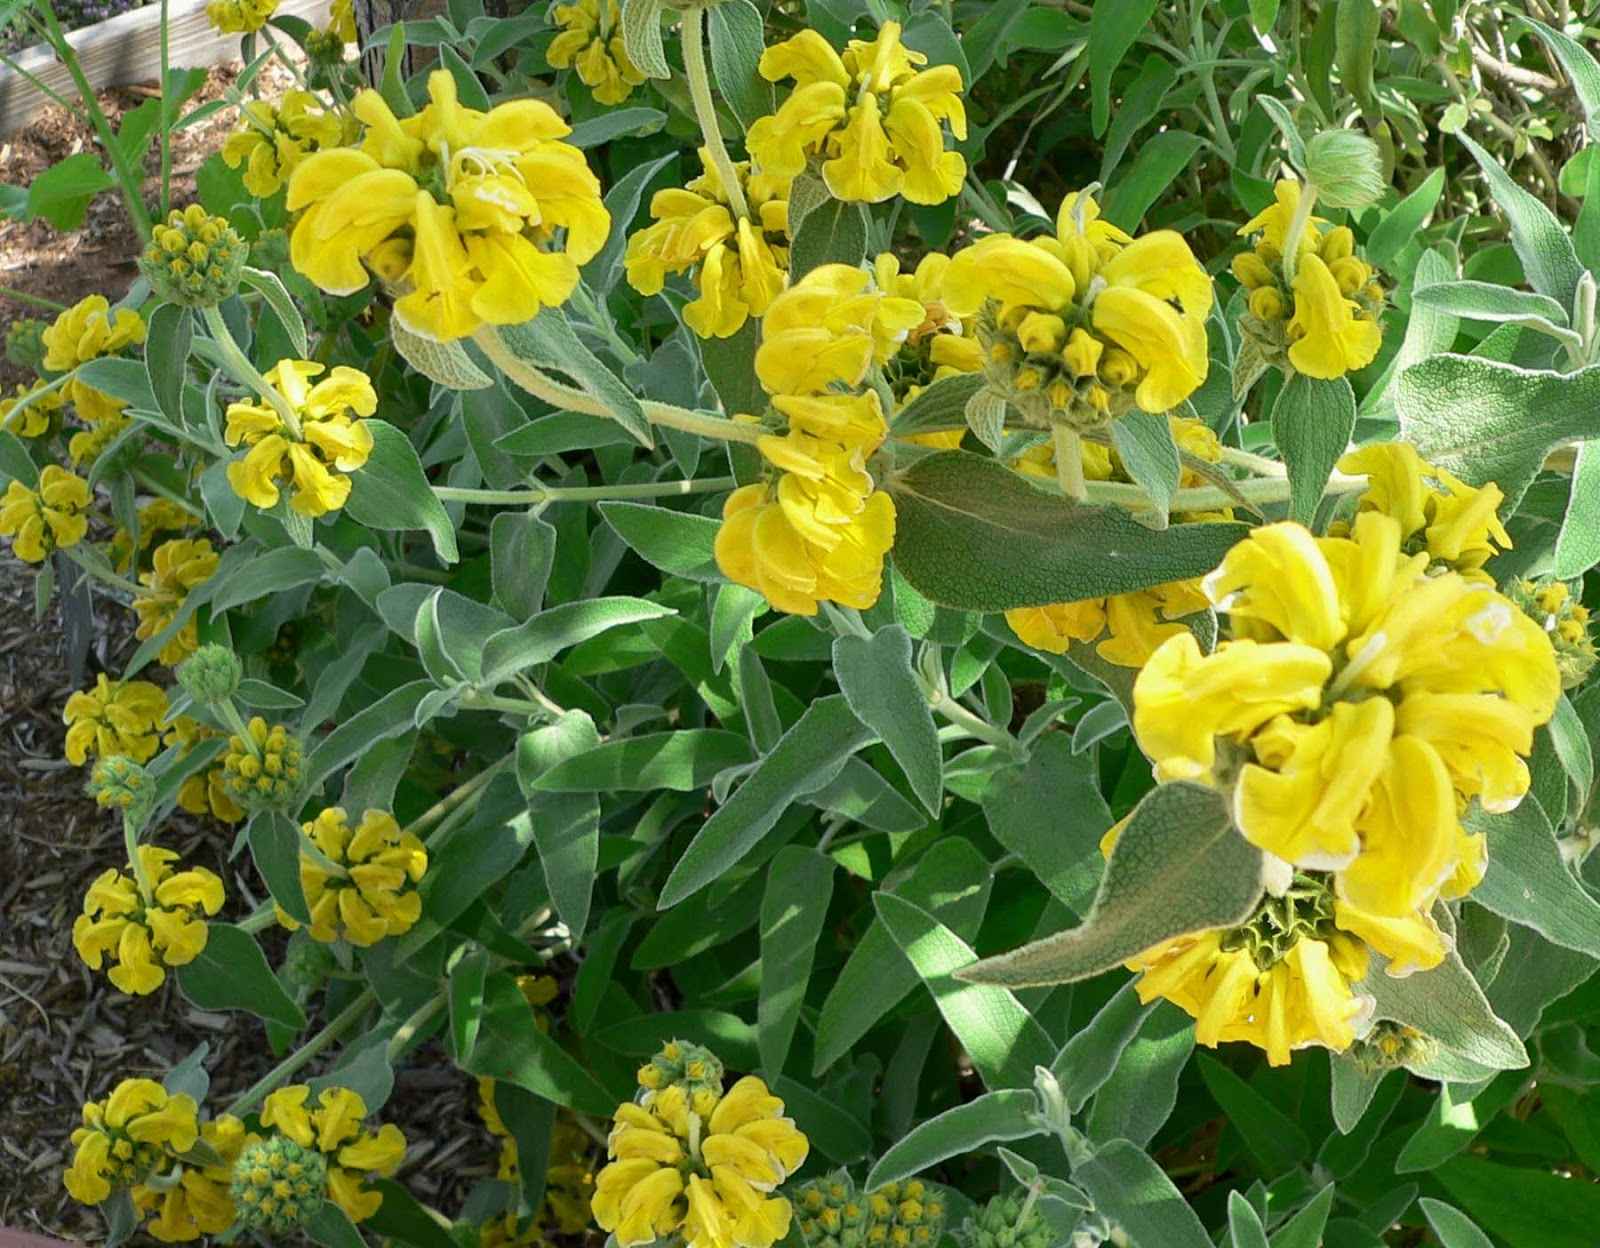 File:Phlomis fruticosa.jpg